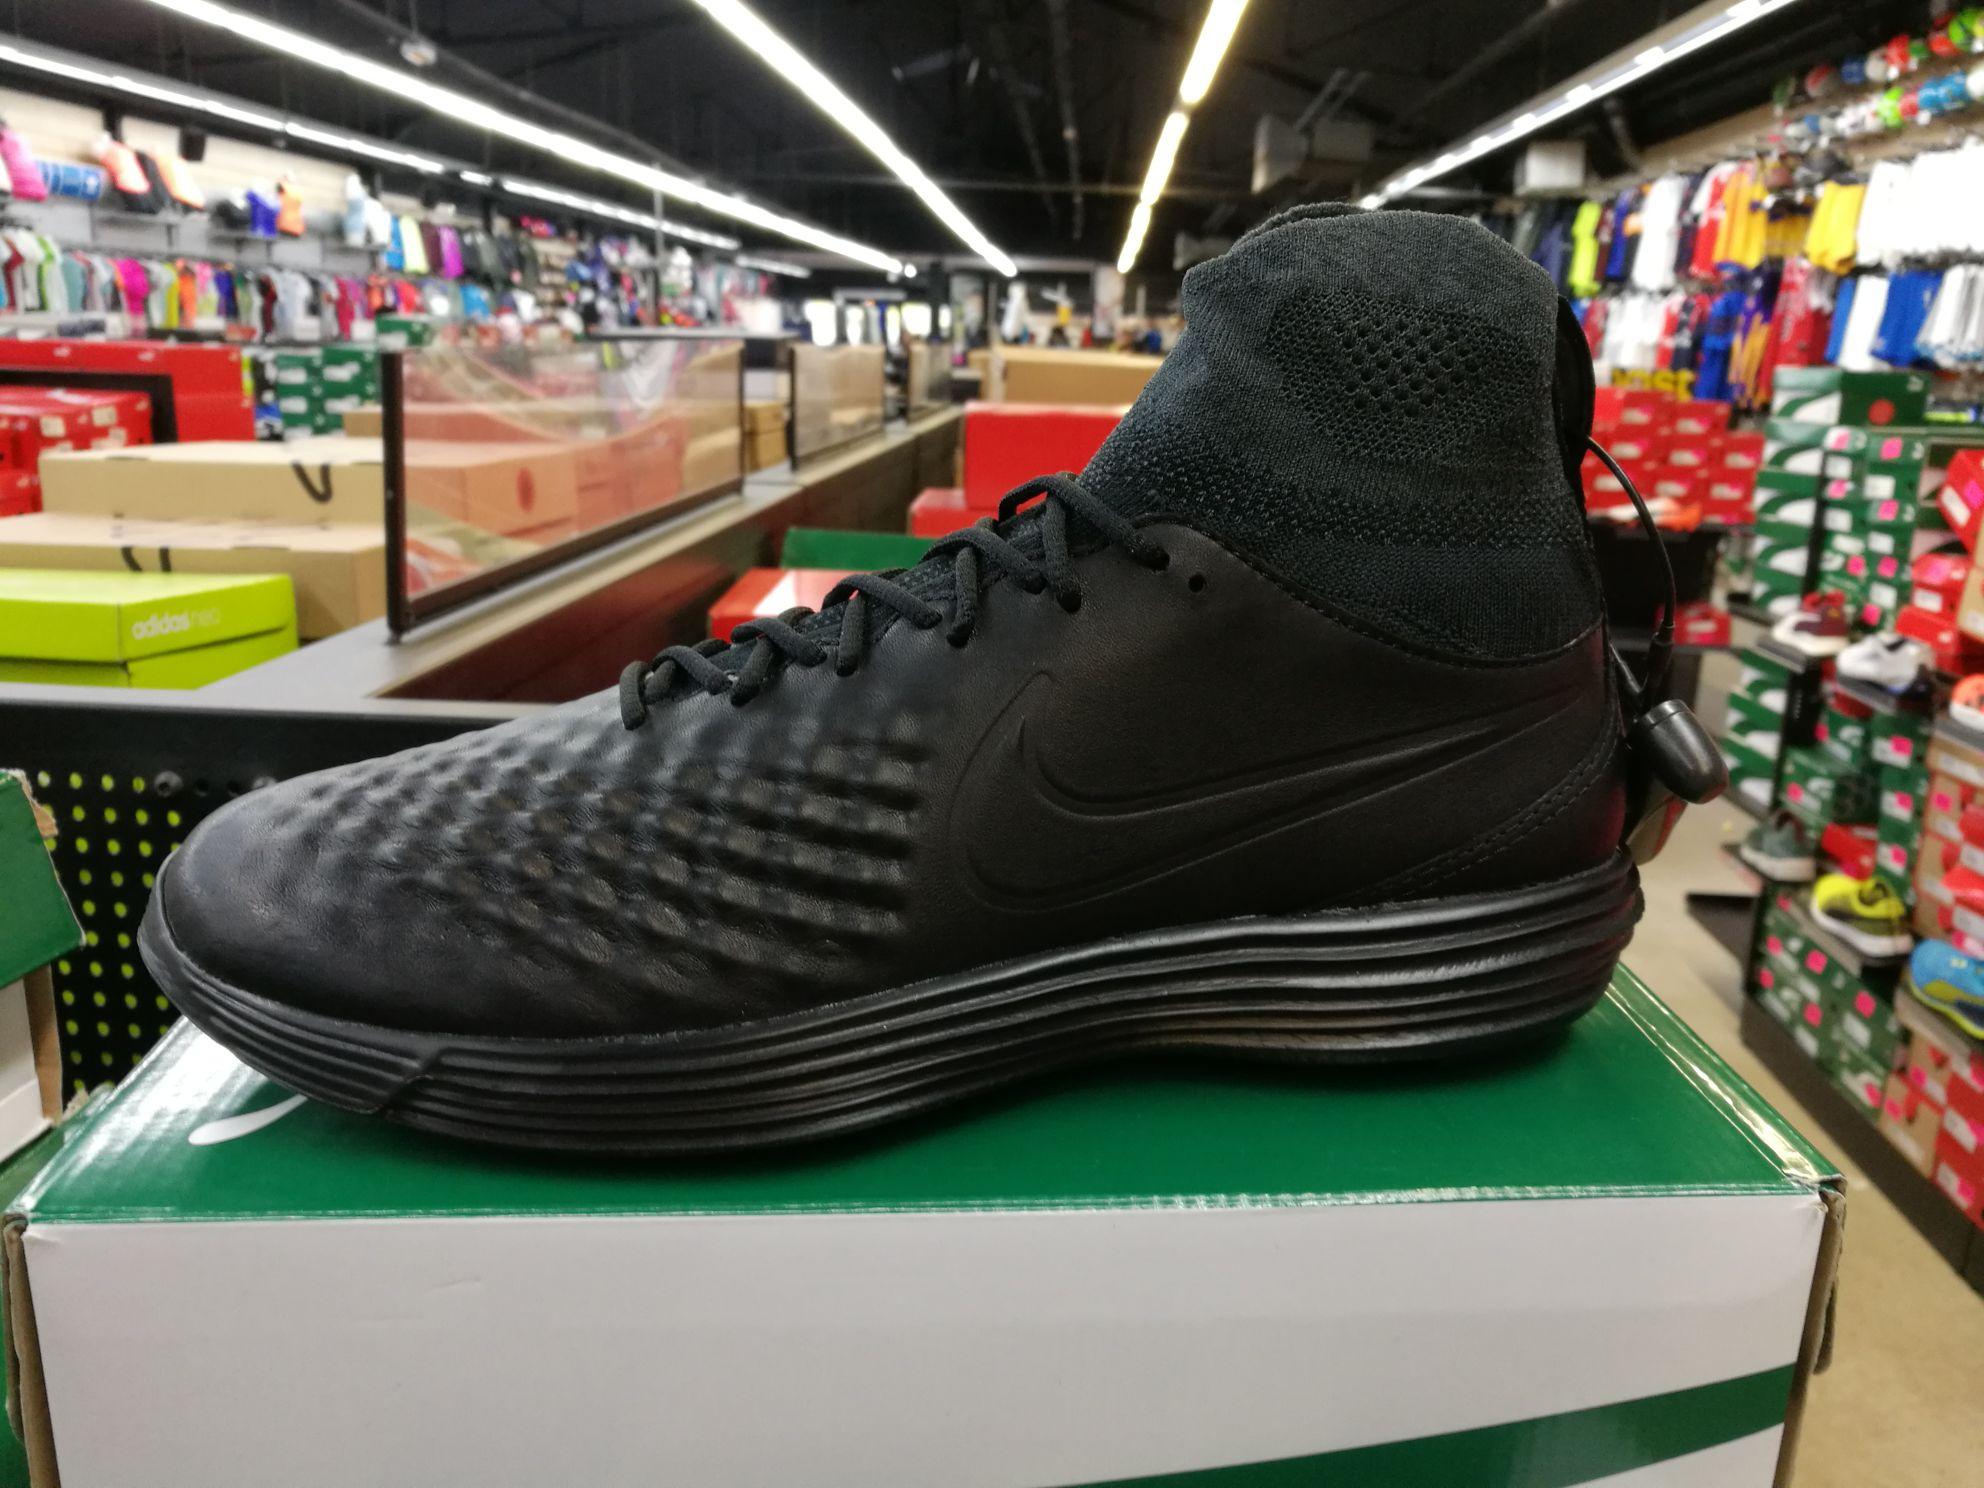 Baskets Nike Lunar Magista II Flyknit - Plusieurs tailles au choix - Destockmania Bondy (93)